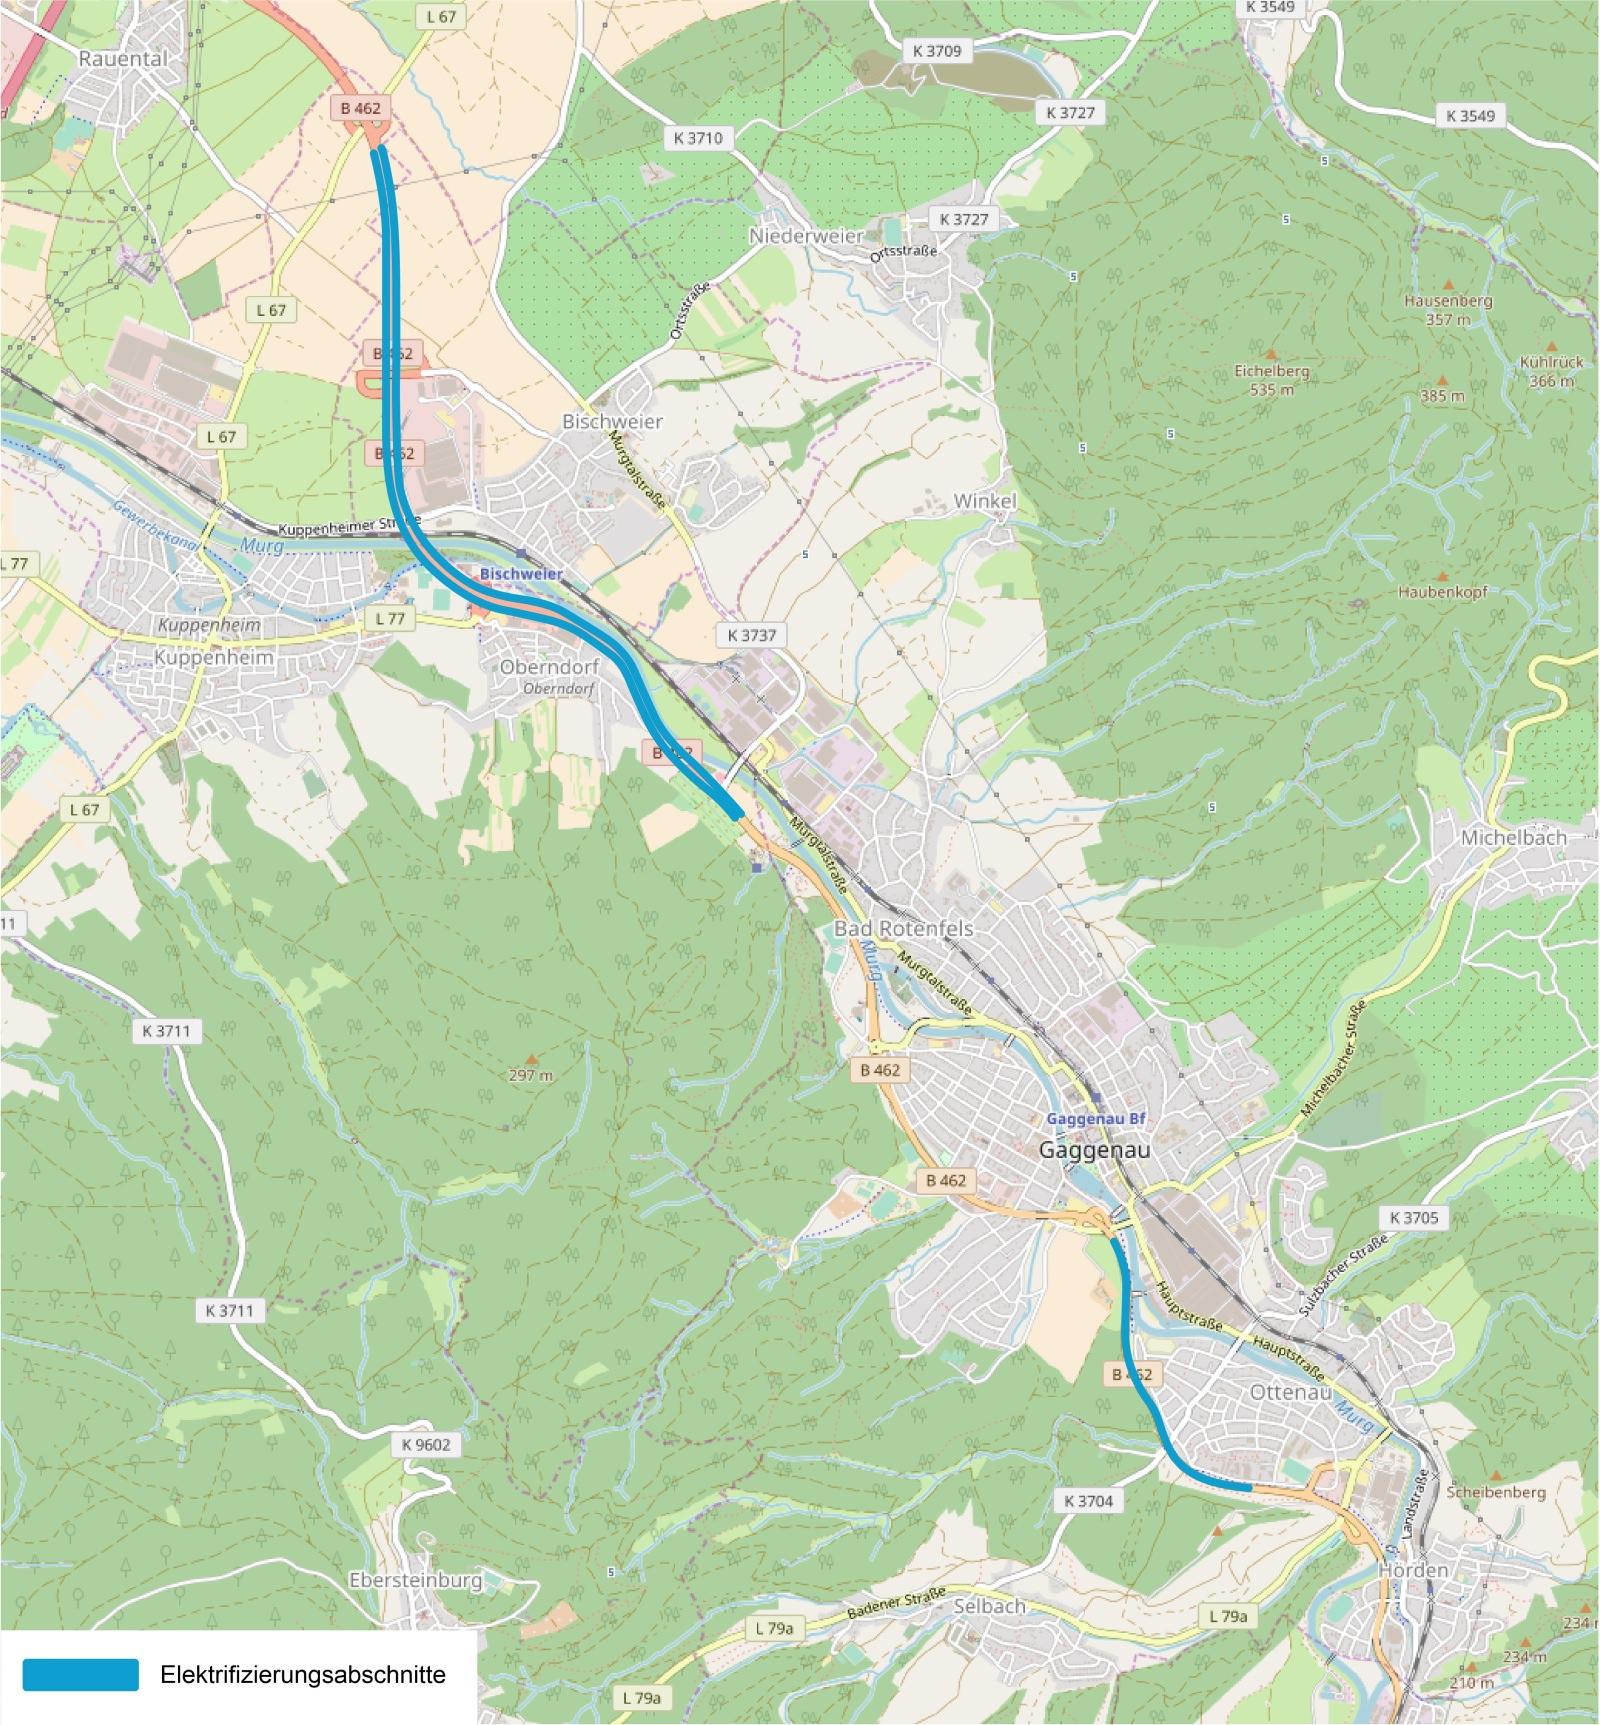 eWayBW Siemens eHighway Pilotstrecke Baden-Württemberg Streckenabschnitte Karte B 462 Obertsrot Kuppenheim